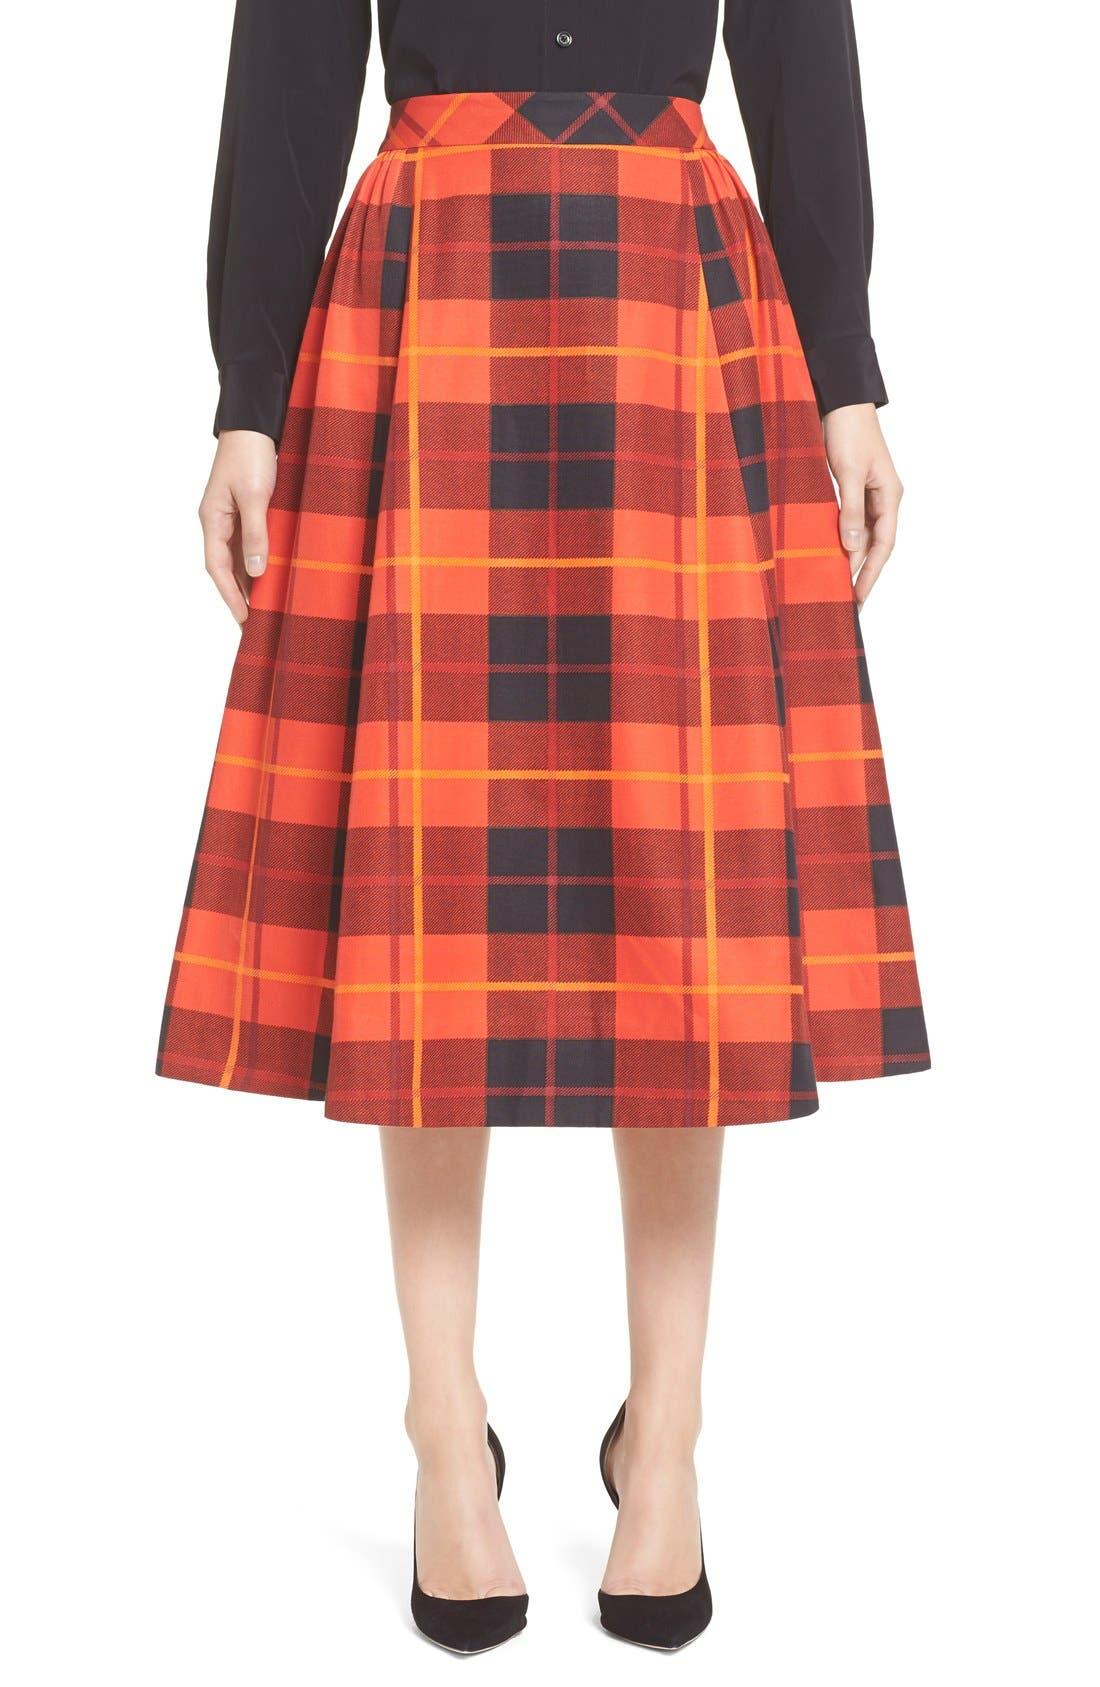 KATE SPADE NEW YORK katespade new yorkwoodland plaid midi skirt, Main, color, 601